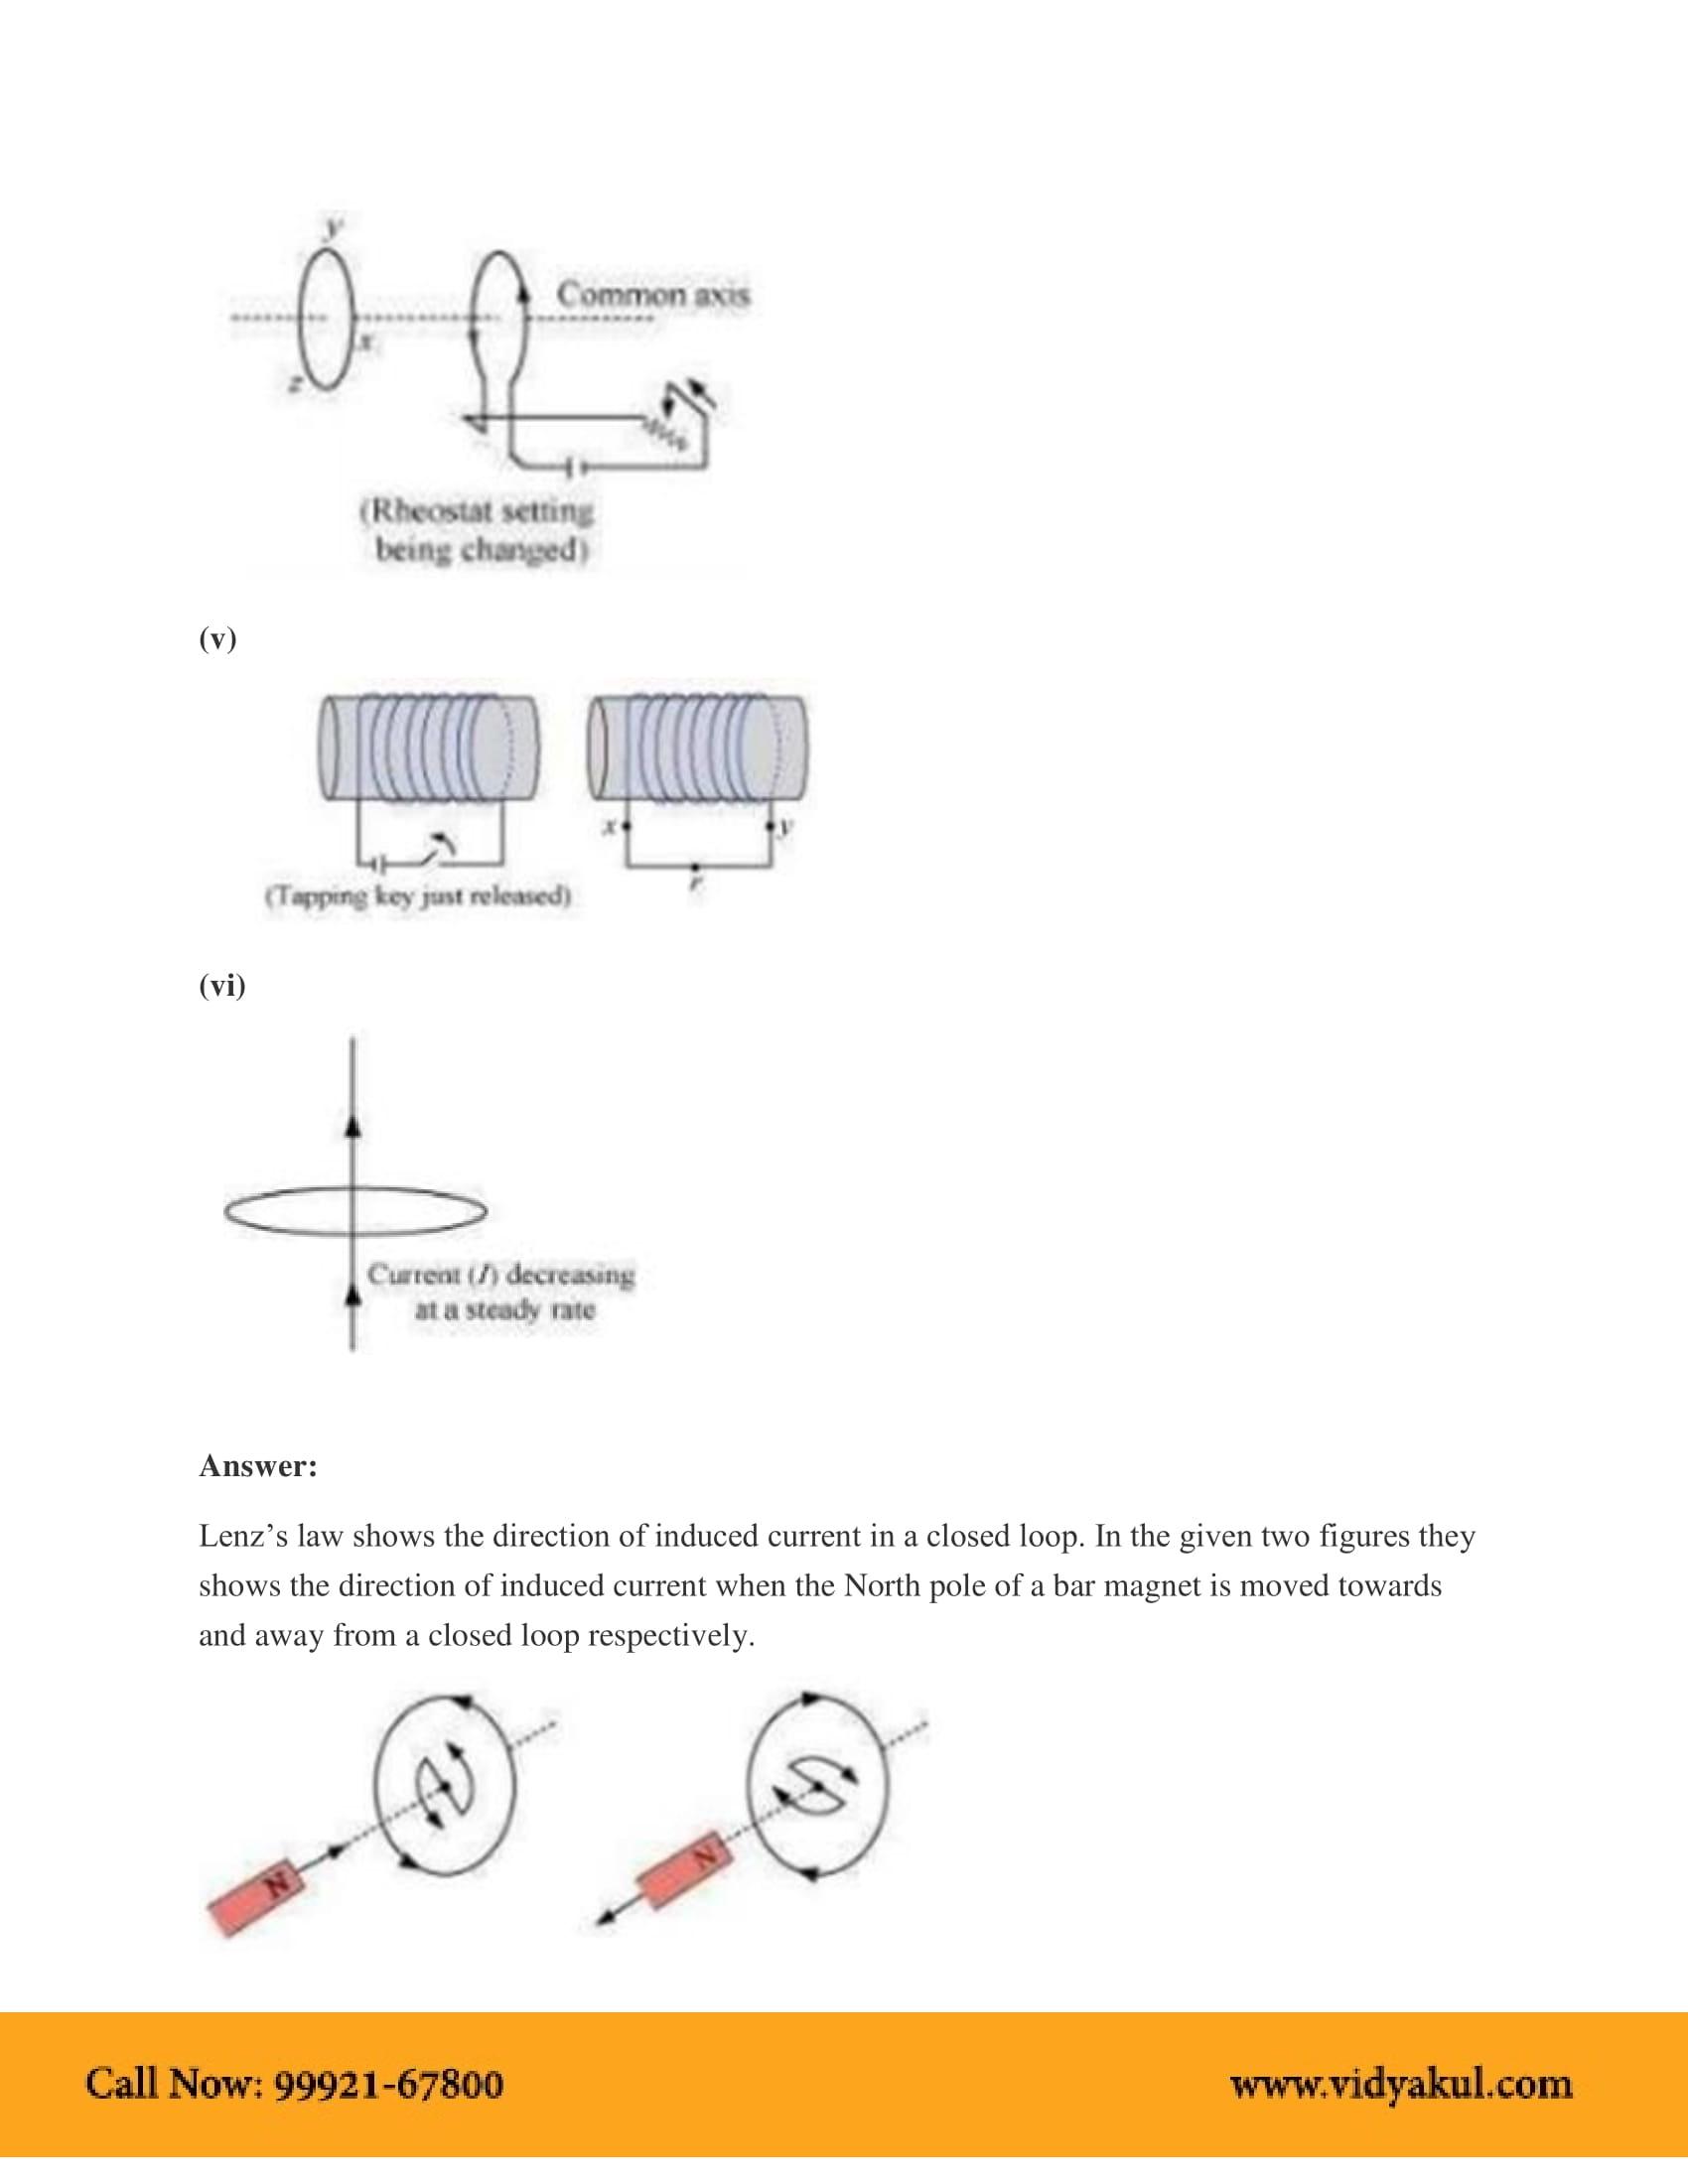 NCERT Solutions for Class 12 Physics Chapter 6 | Vidyakul